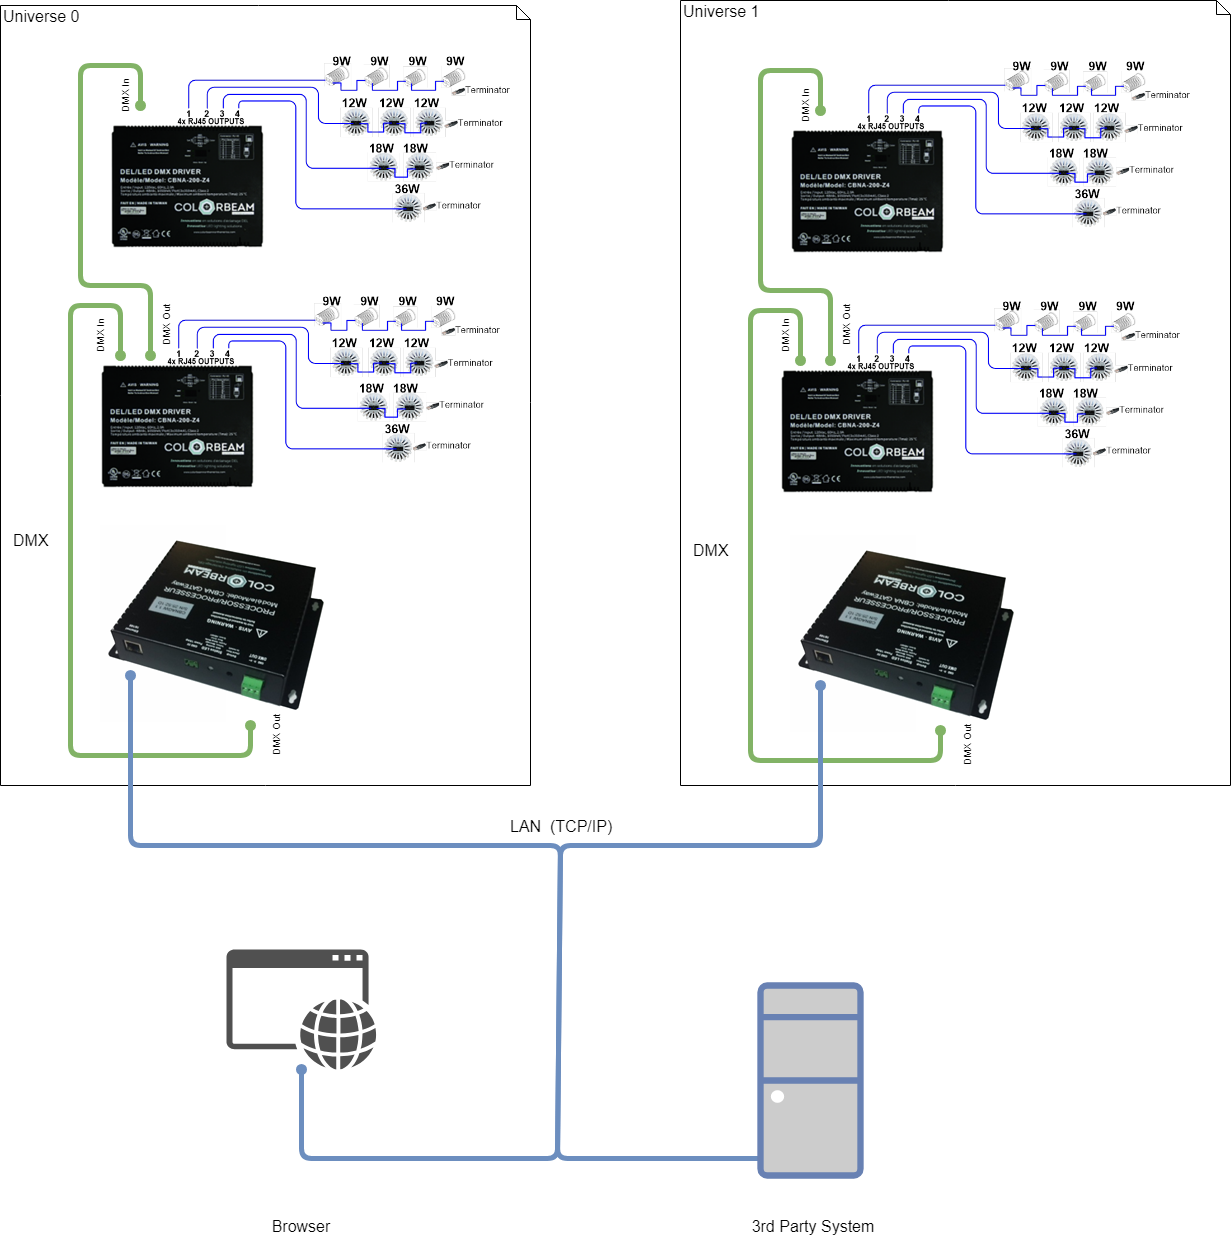 dmx network